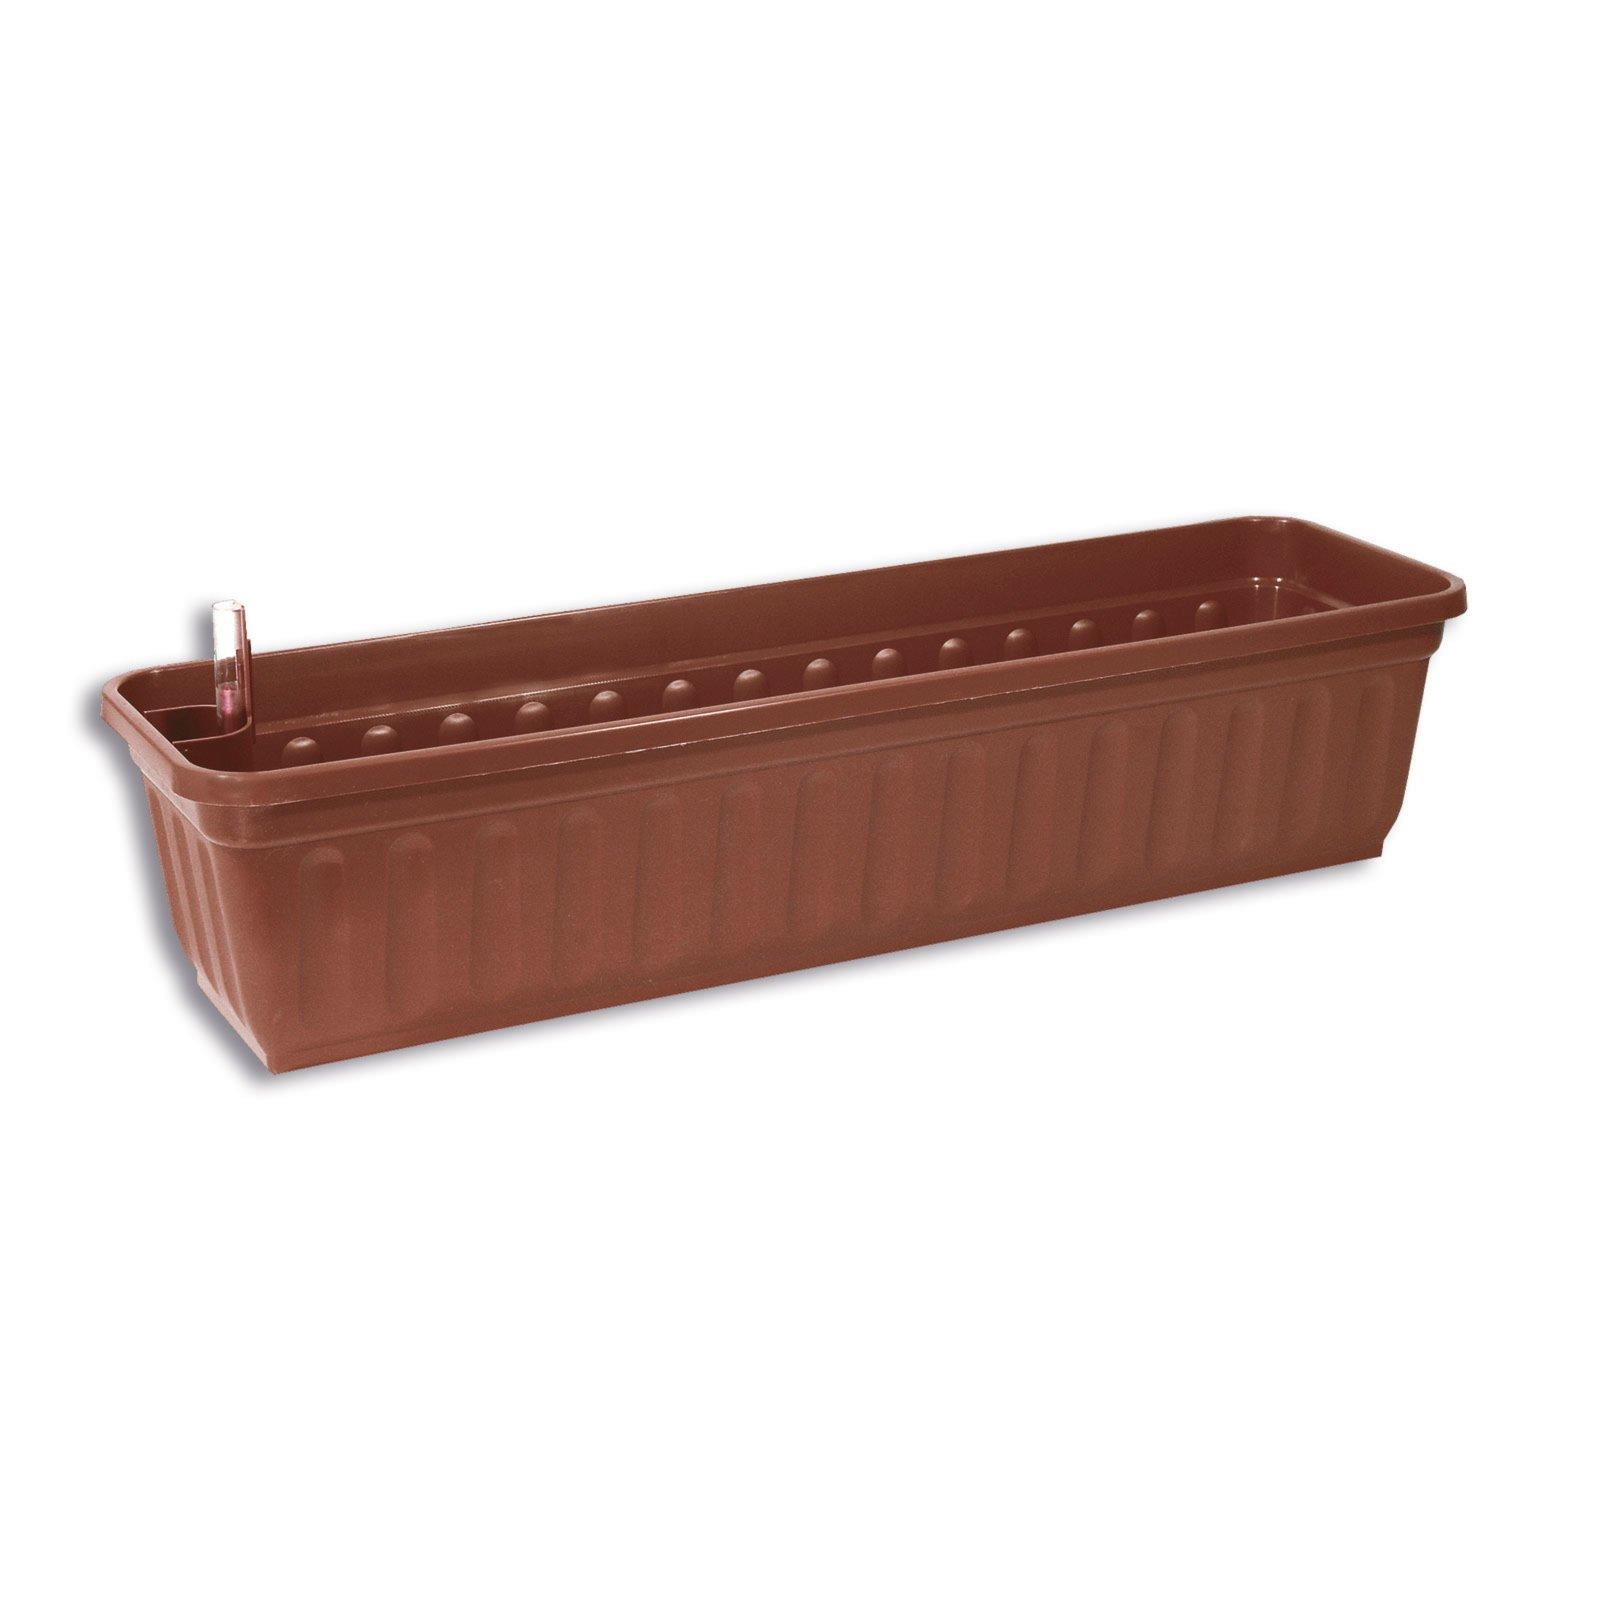 blumenkasten aqua perfect braun l nge 80 cm. Black Bedroom Furniture Sets. Home Design Ideas